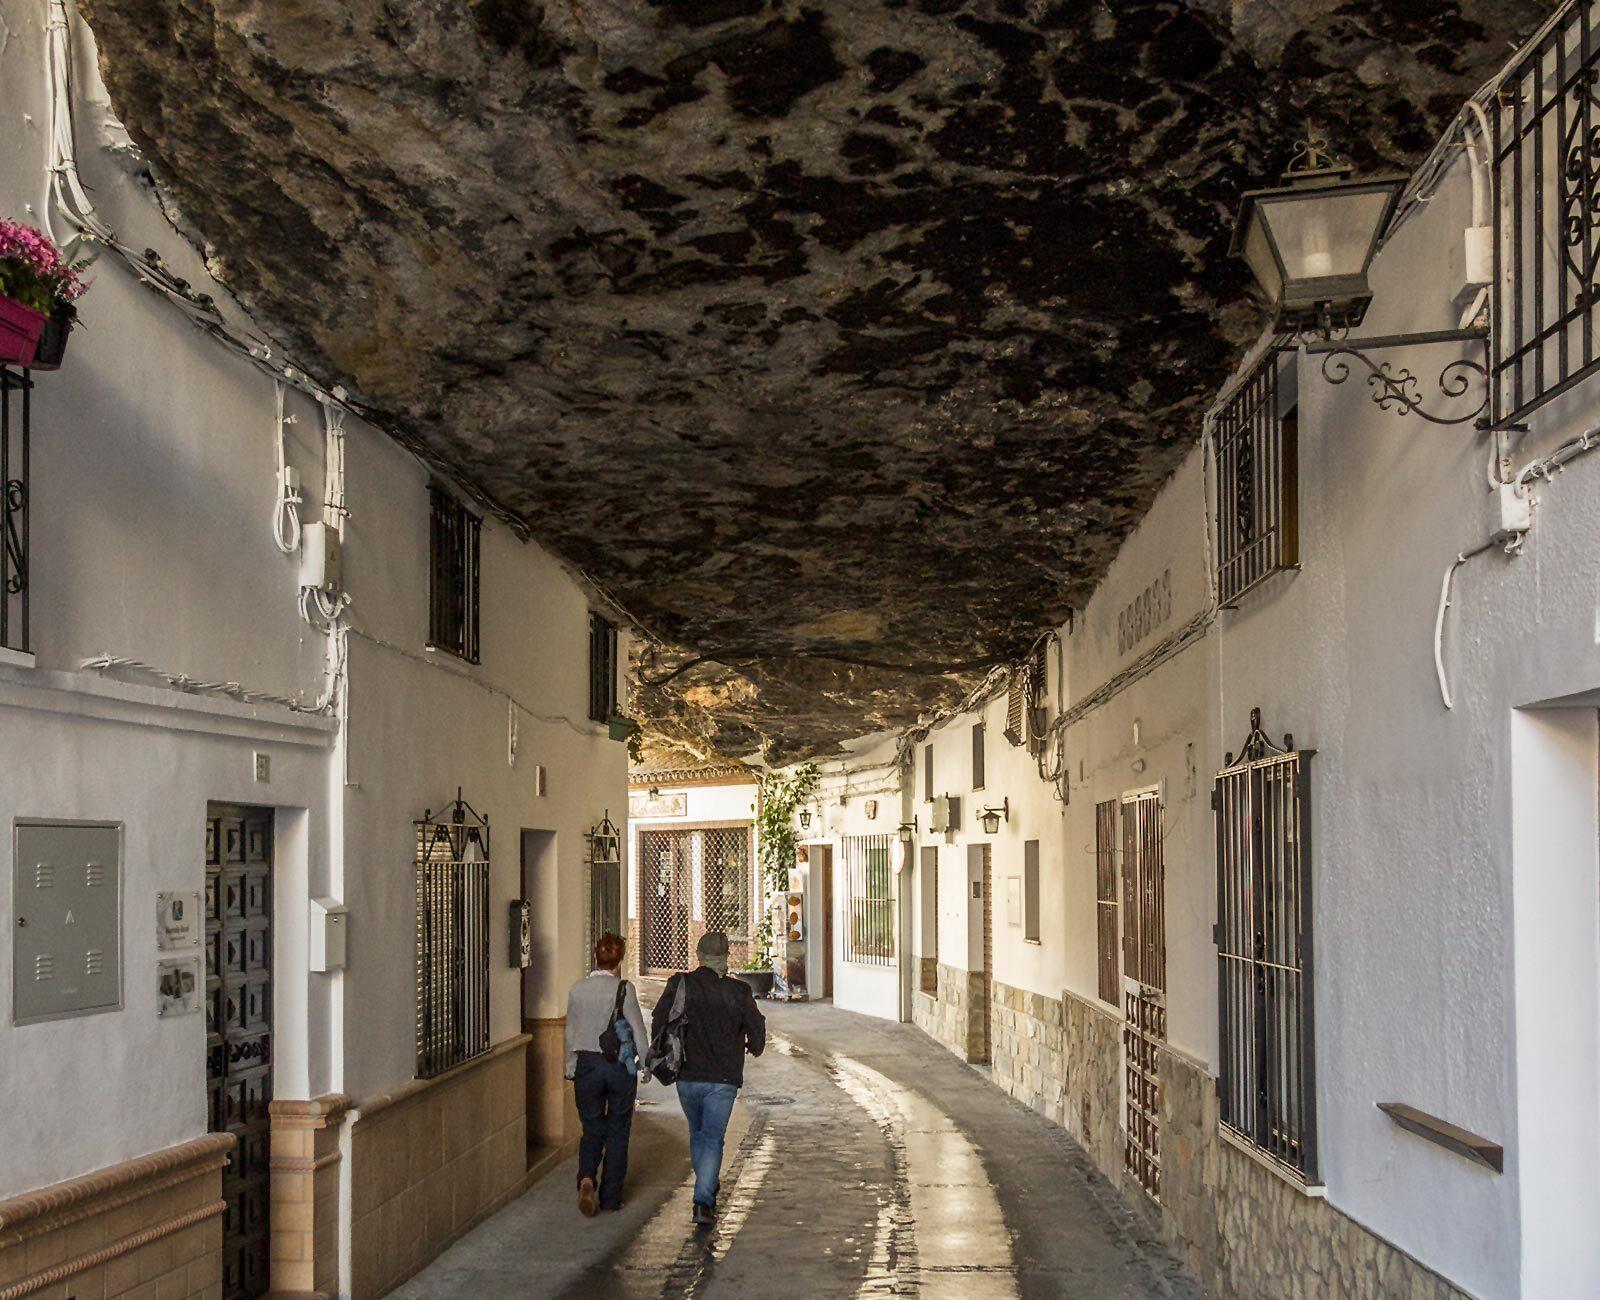 Setenil de las Bodegas: En landsby indbygget i klipper